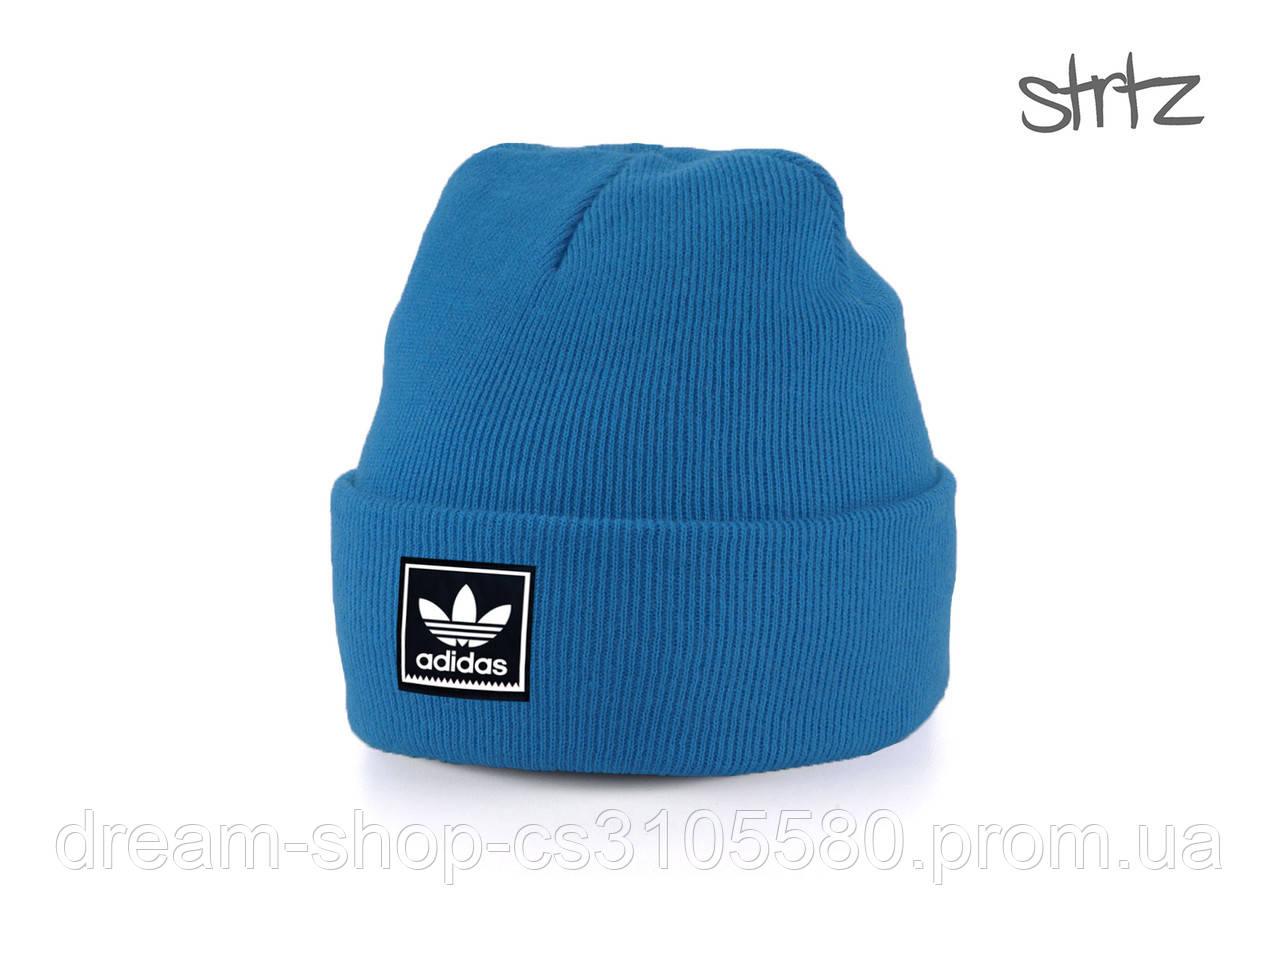 Акриловая шапка Адидас (унисекс), Демисезонная шапка Adidas